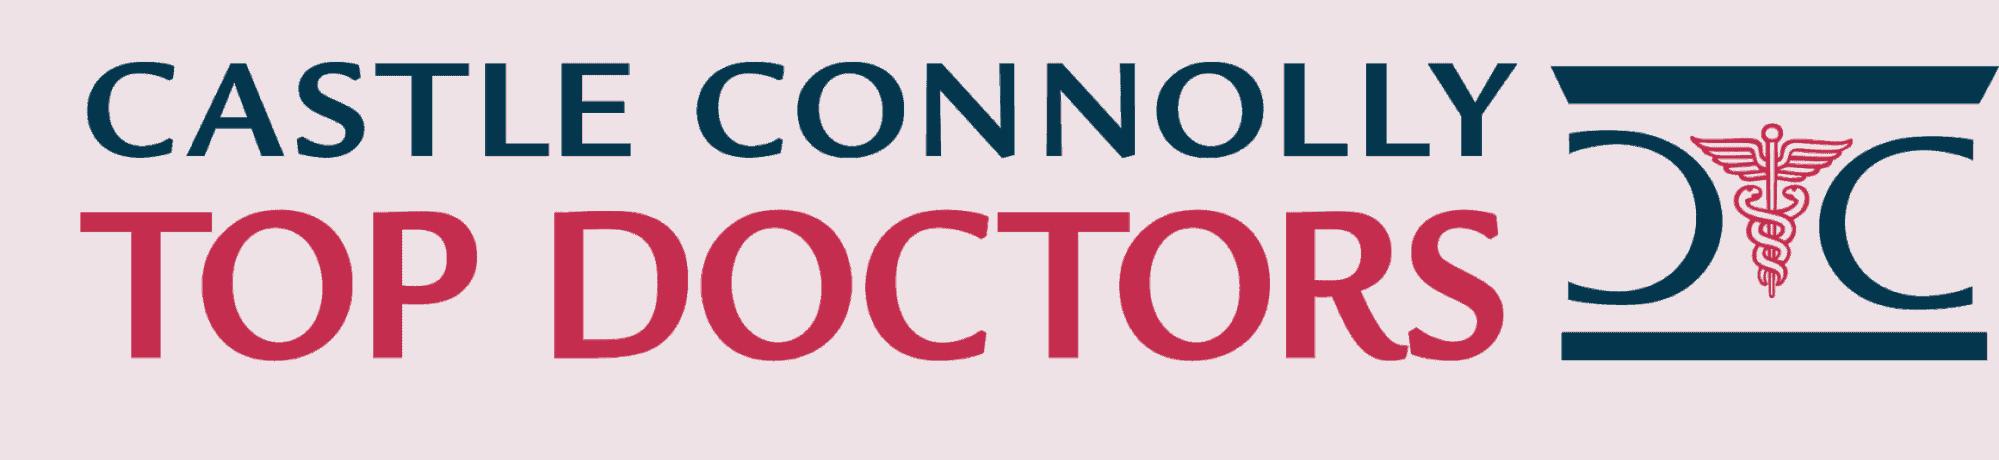 Castle Connolly Top Doctors 2017 Overland Park